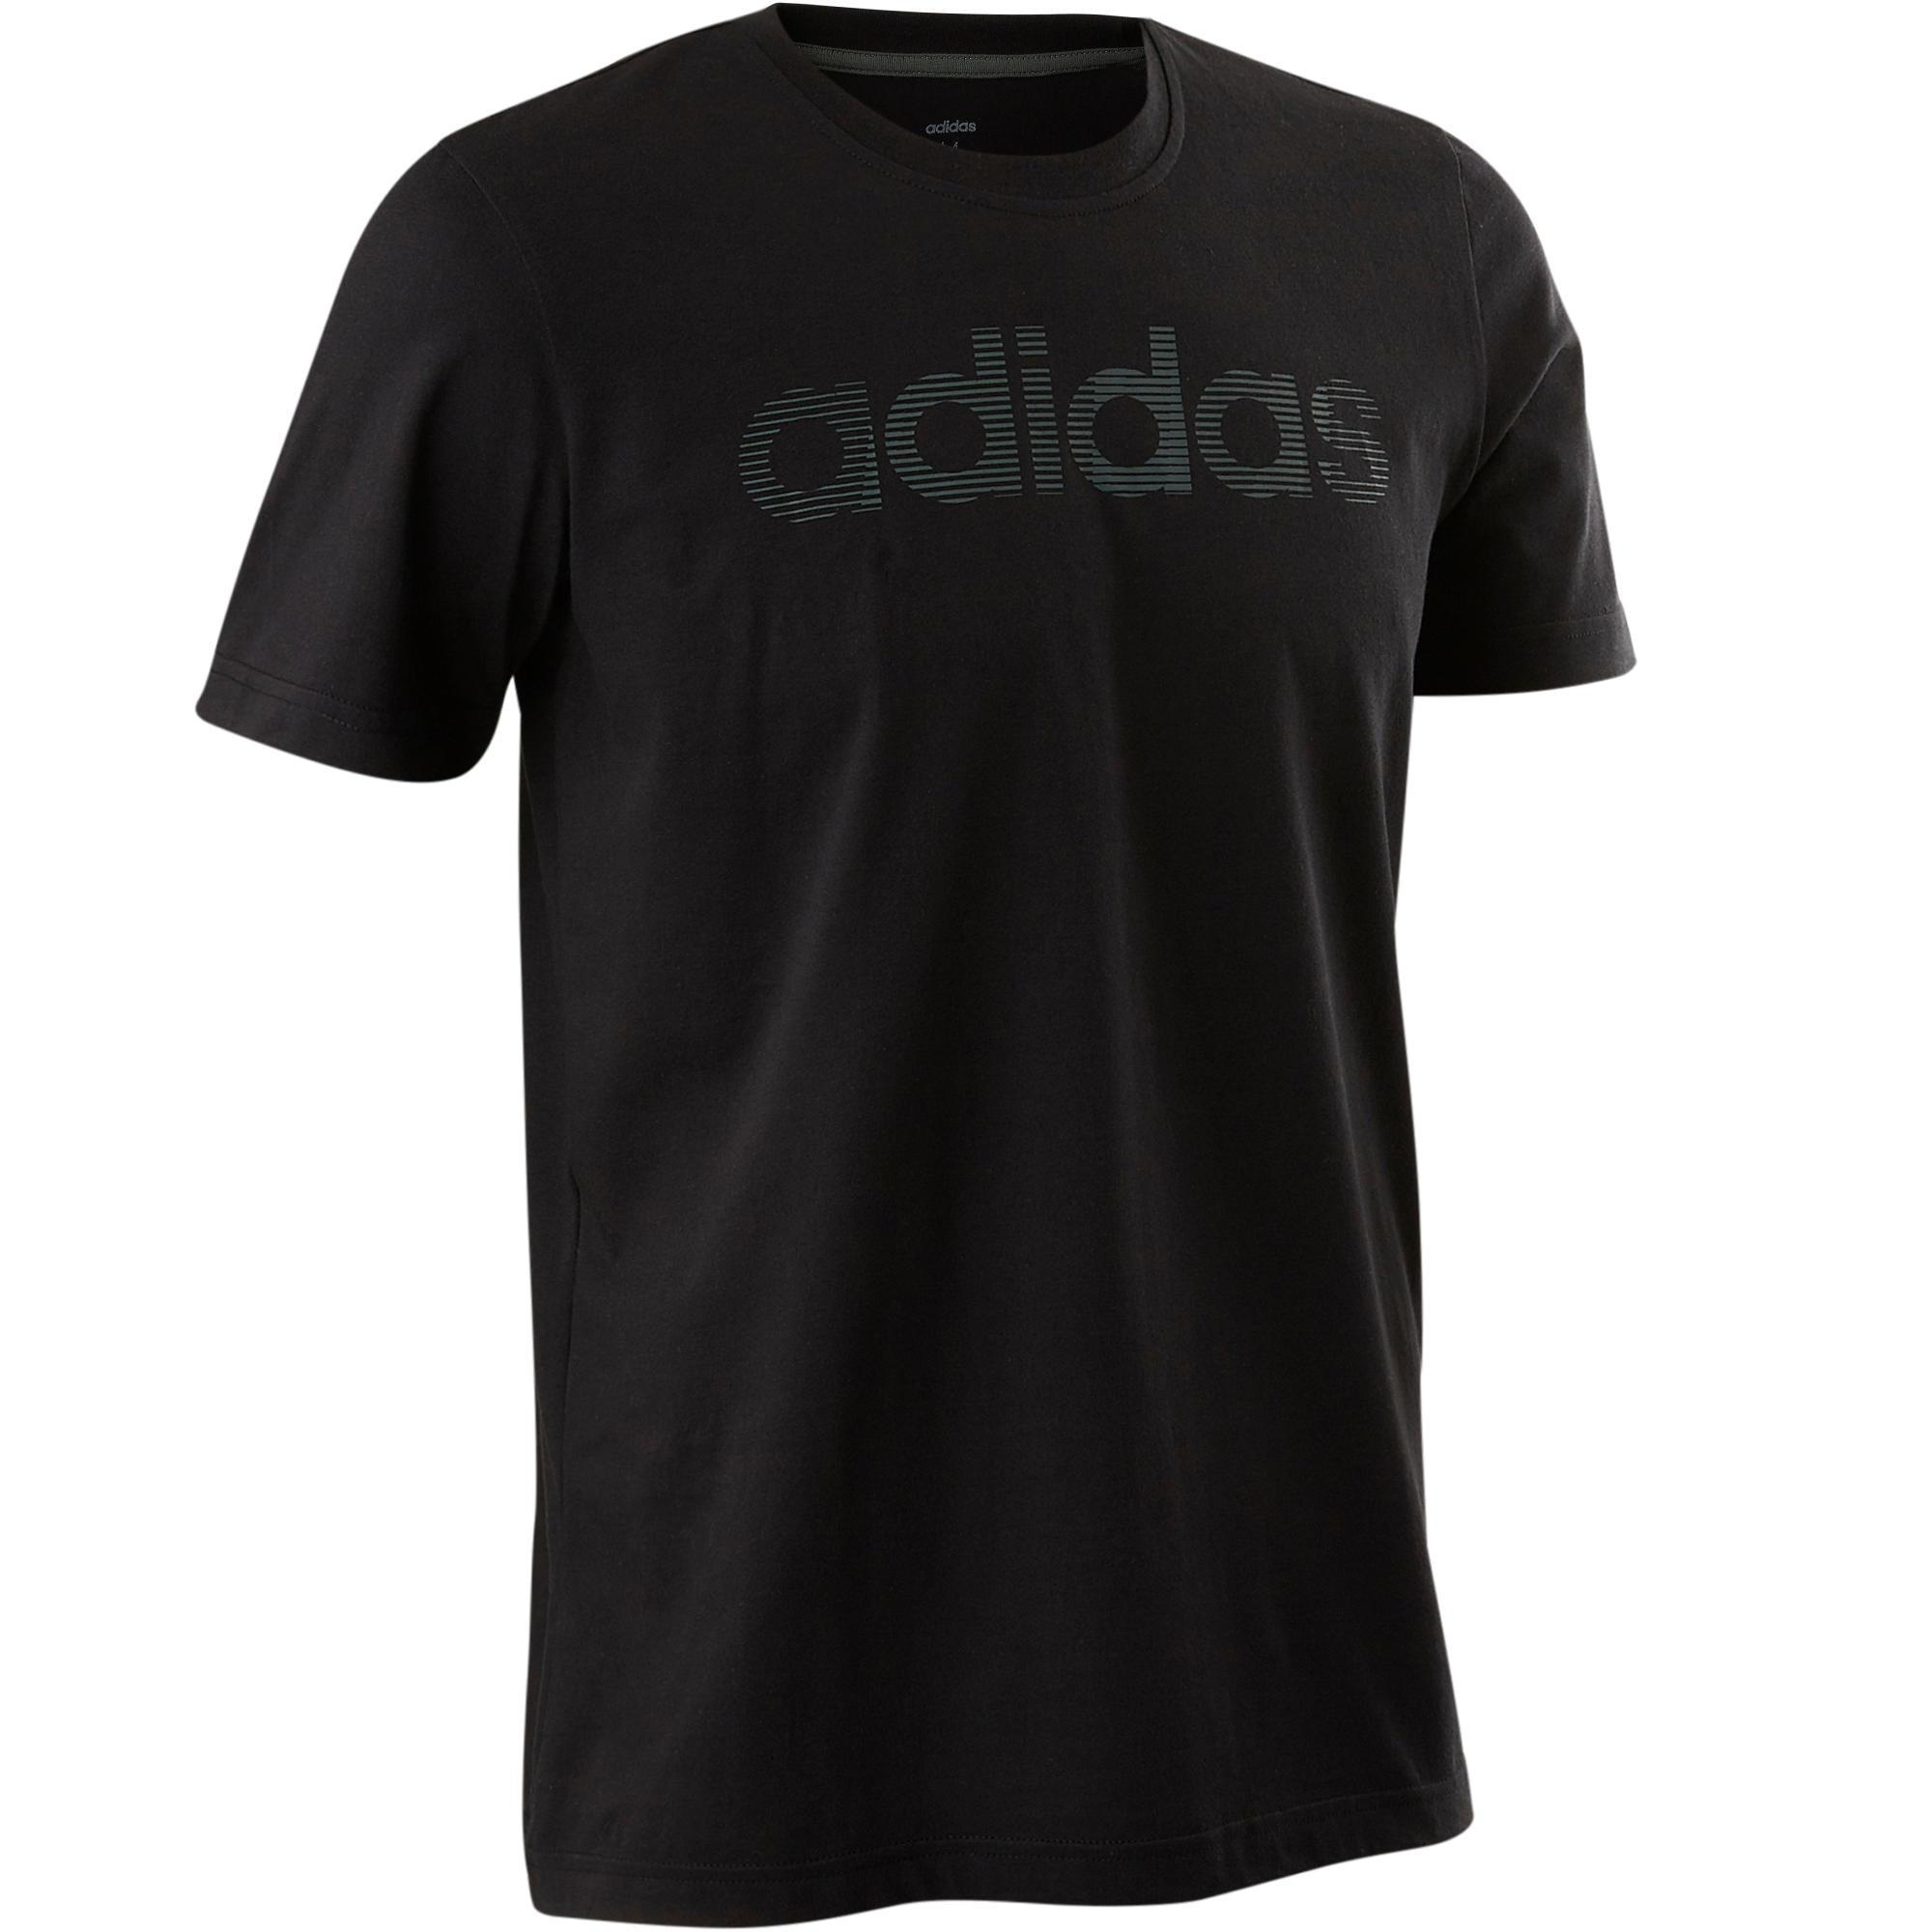 8ebd7acb7ef Adidas T-shirt Adidas Decadio 500 pilates lichte gym heren zwart |  Decathlon.nl